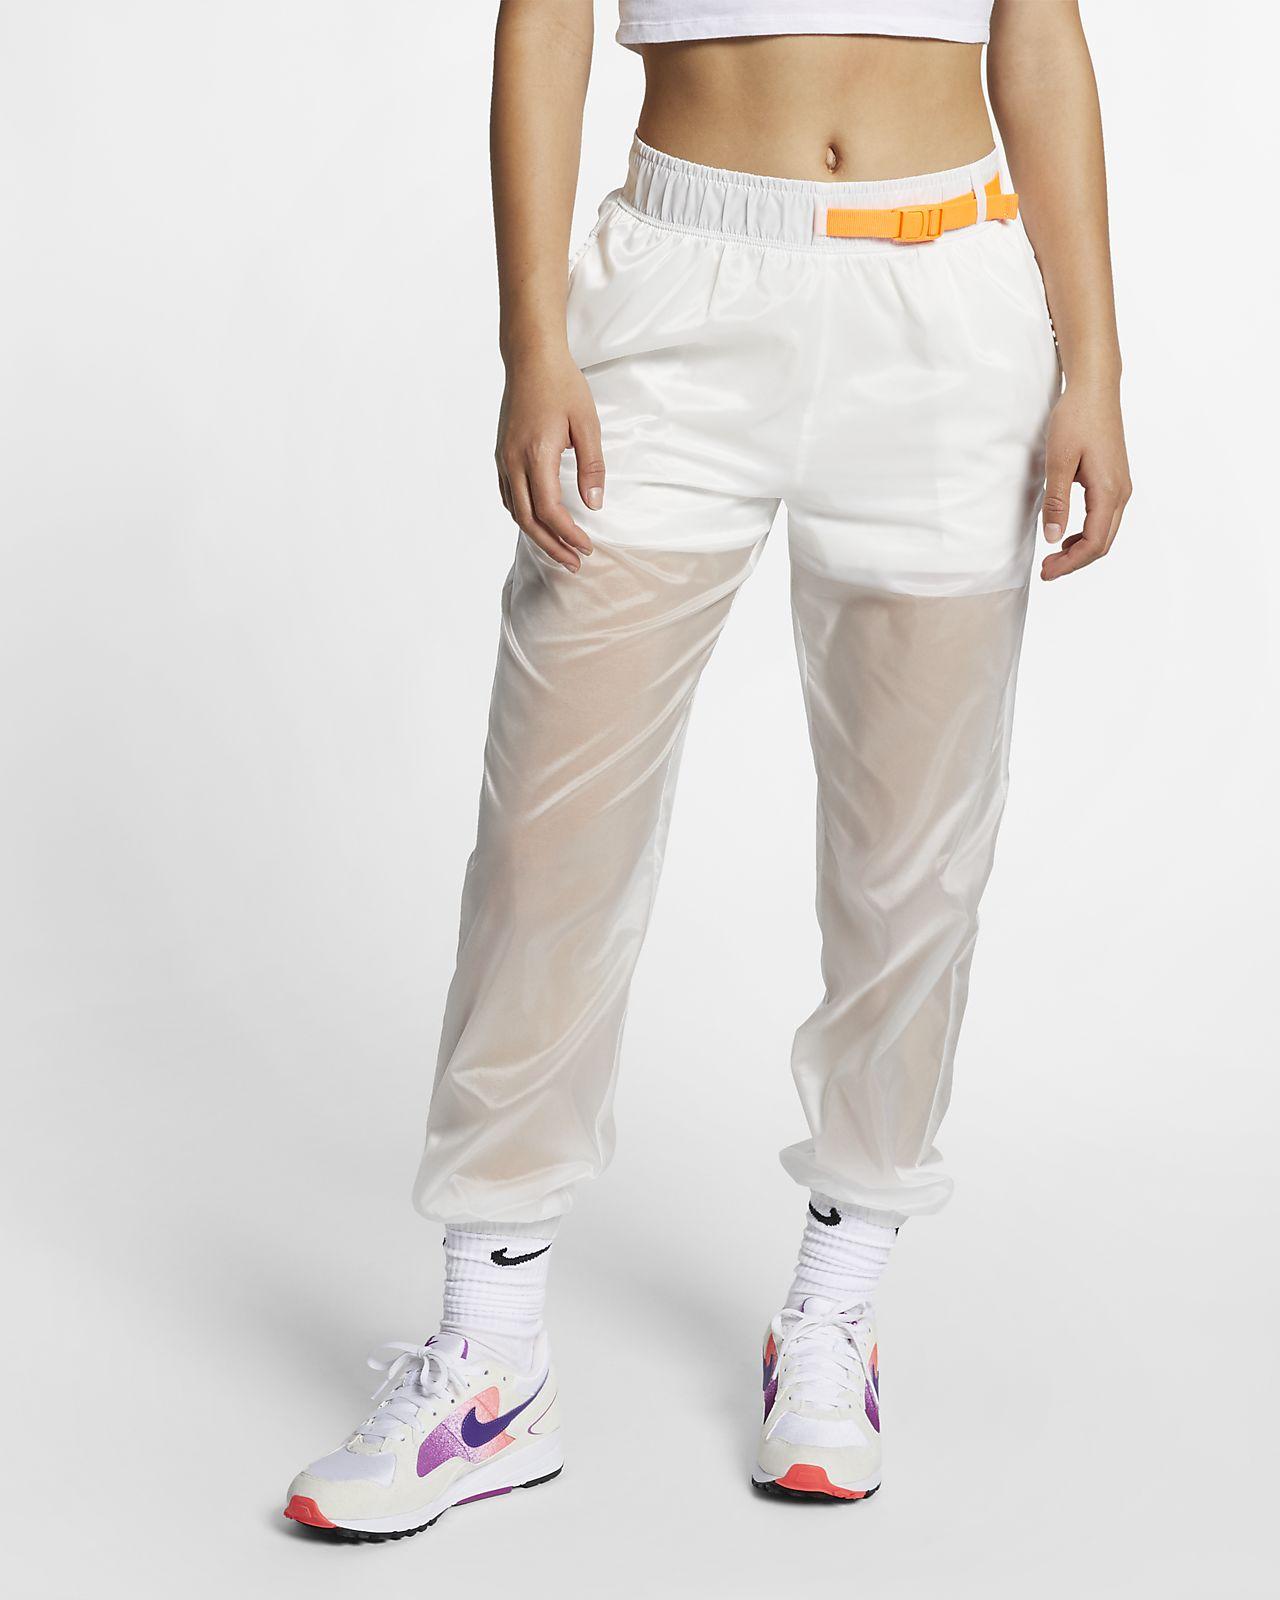 Женские брюки из тканого материала Nike Sportswear Tech Pack